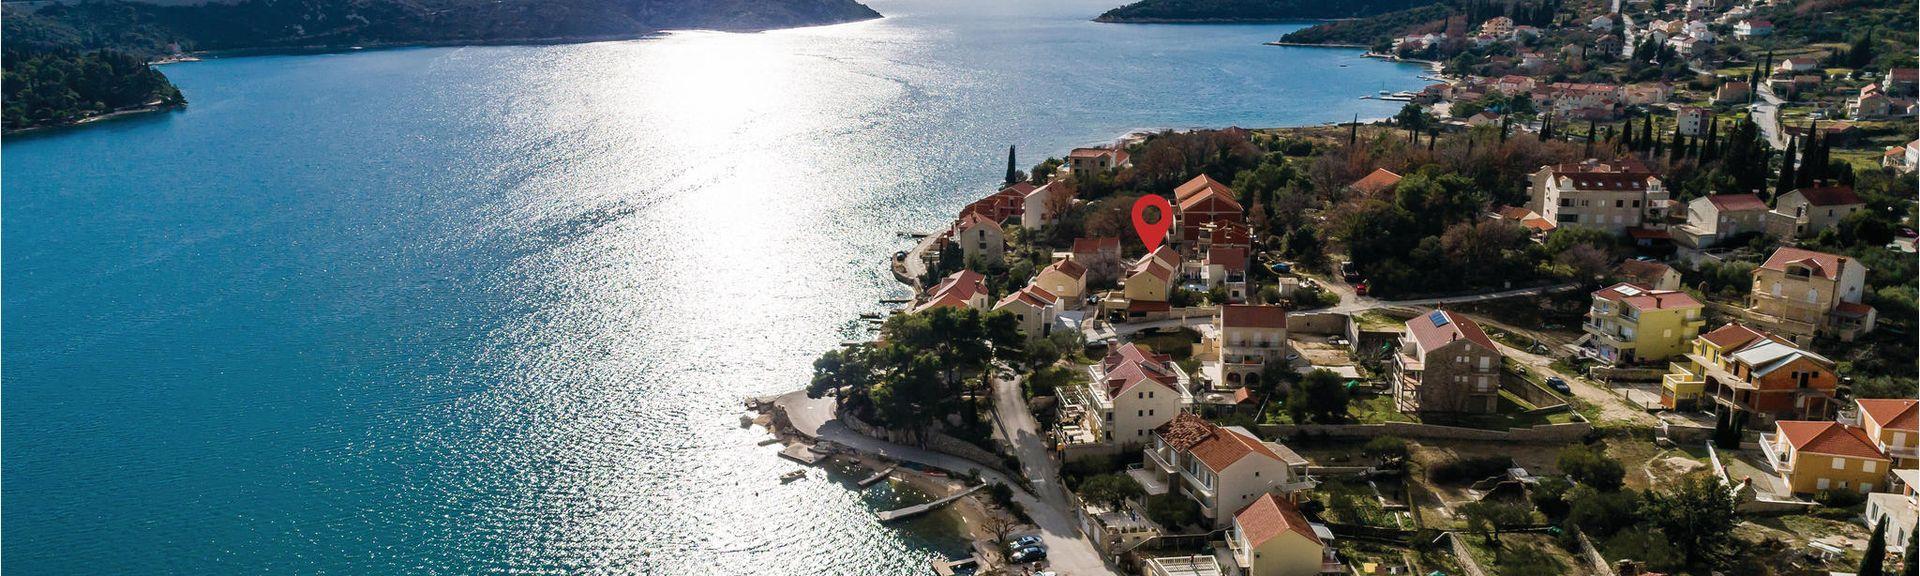 Trsteno, Dubrovnik, Dubrovnik-Neretva, Kroatien